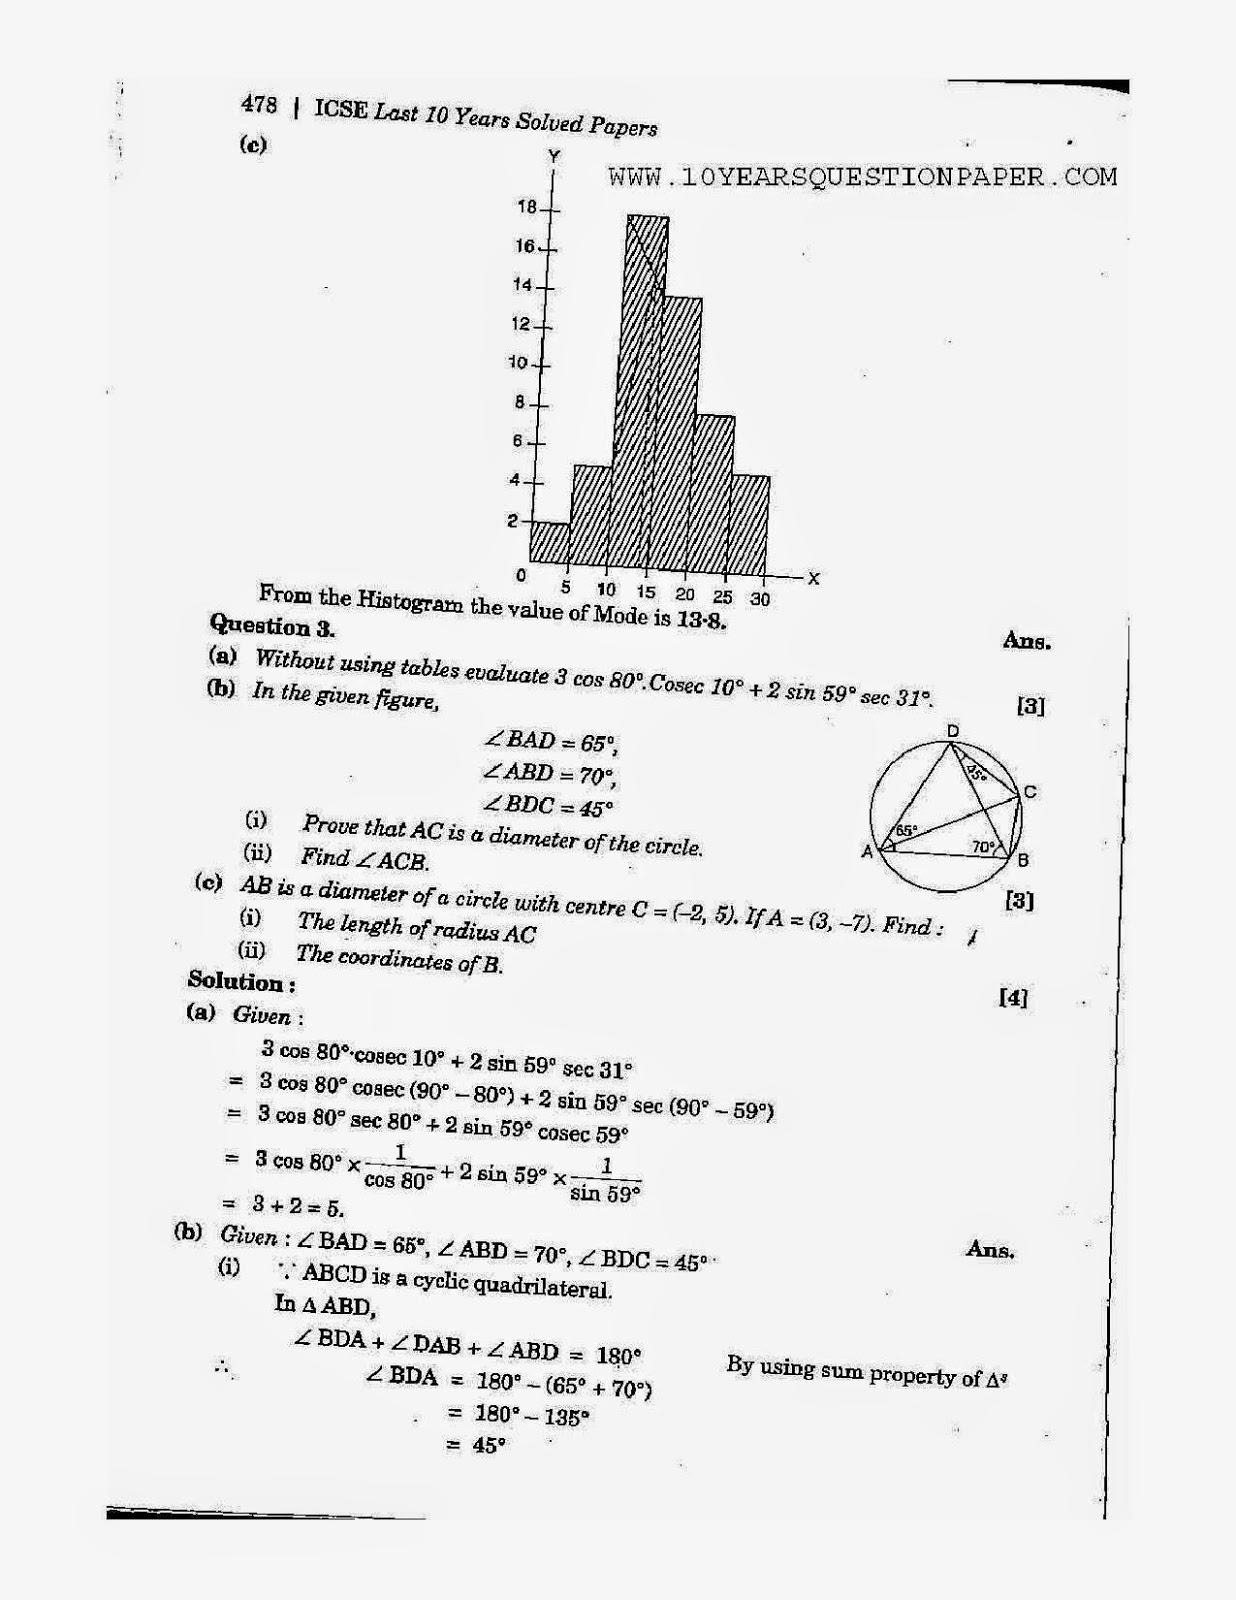 2014 ICSE (Class 10) Board Paper Solution: Mathematics